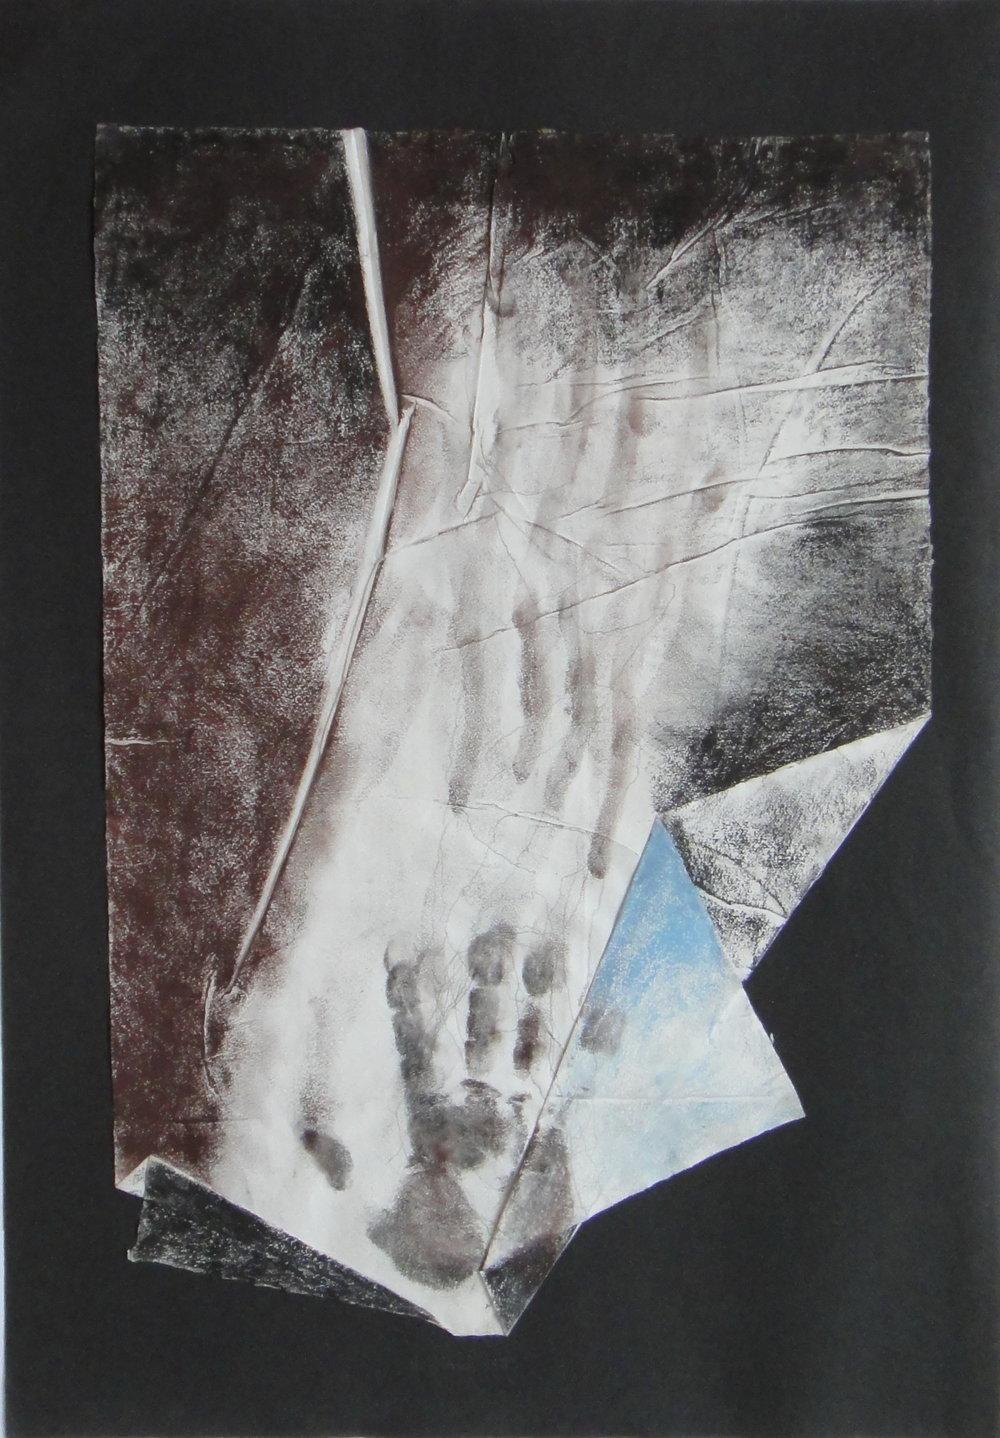 Kern Michal, 1993, Kresba z jaskyne, komb tech, 57x40.jpg